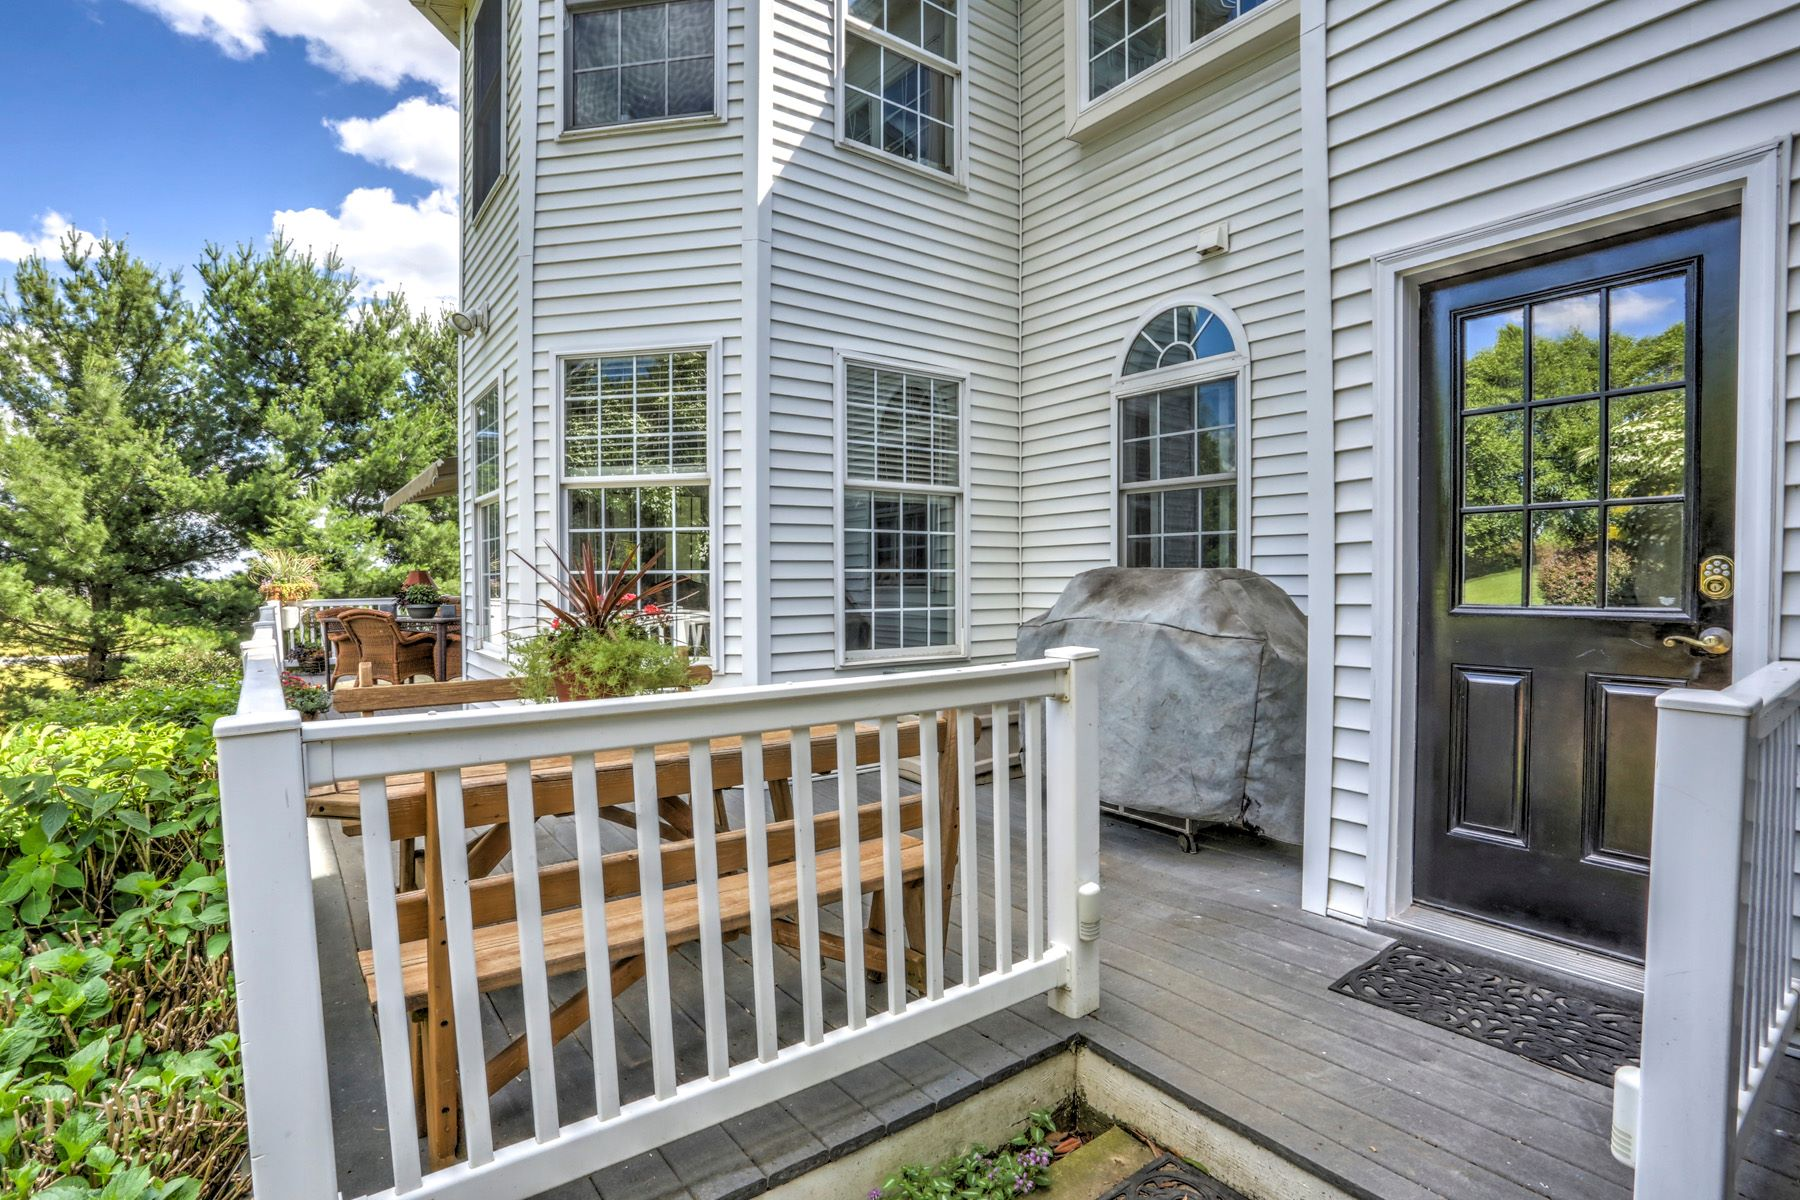 Additional photo for property listing at 195 W Millport Rd 195 W Millport Rd Lititz, Pennsylvania 17543 Estados Unidos